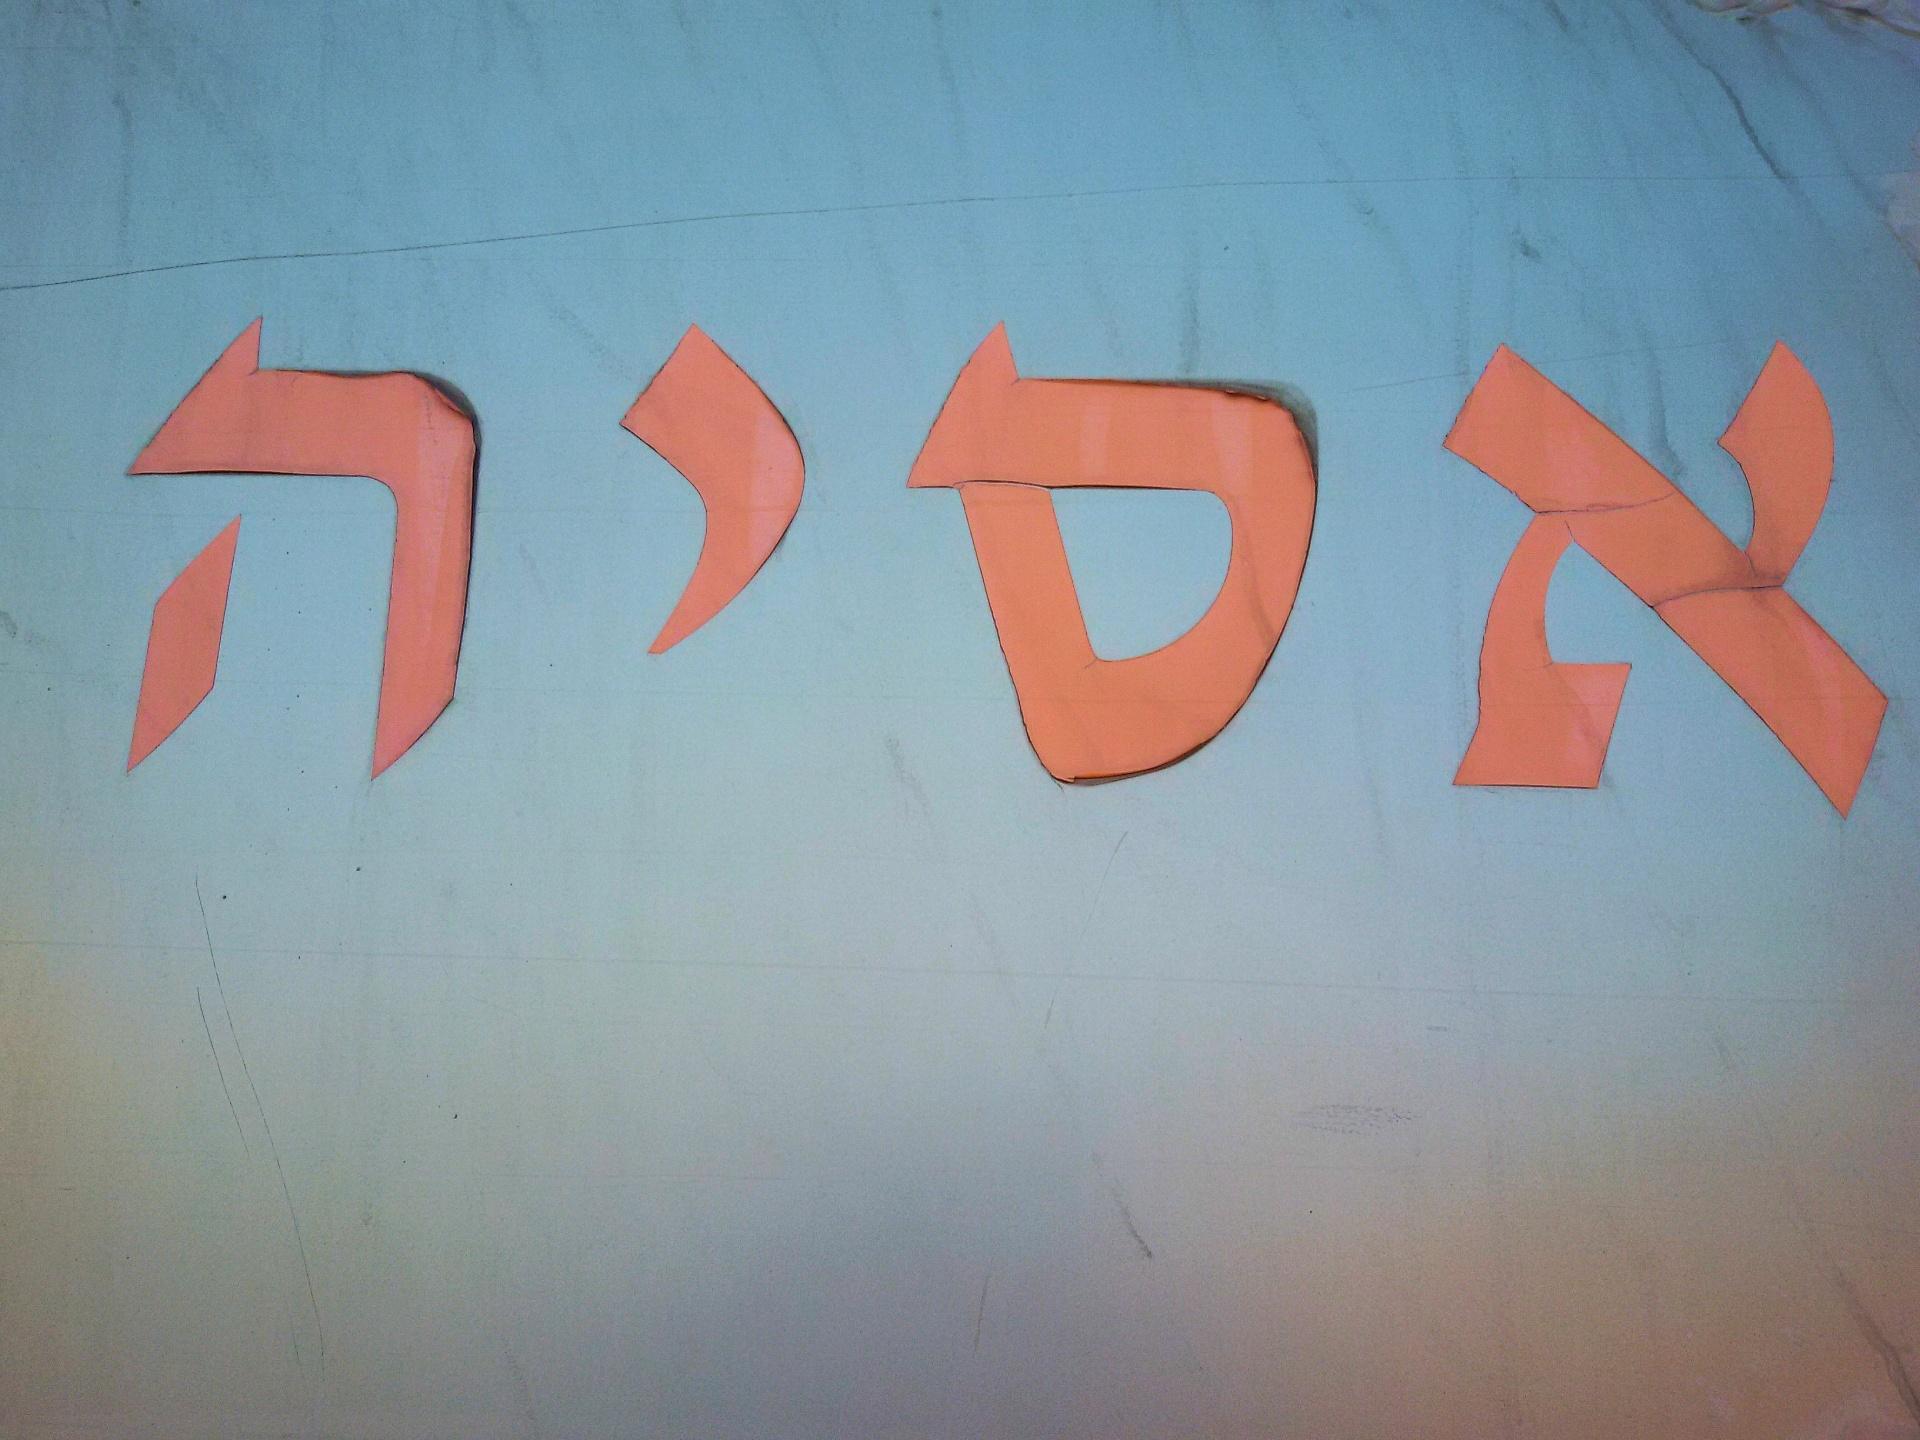 Hebrew,letters,asia,alphabet,font - free photo from needpix com